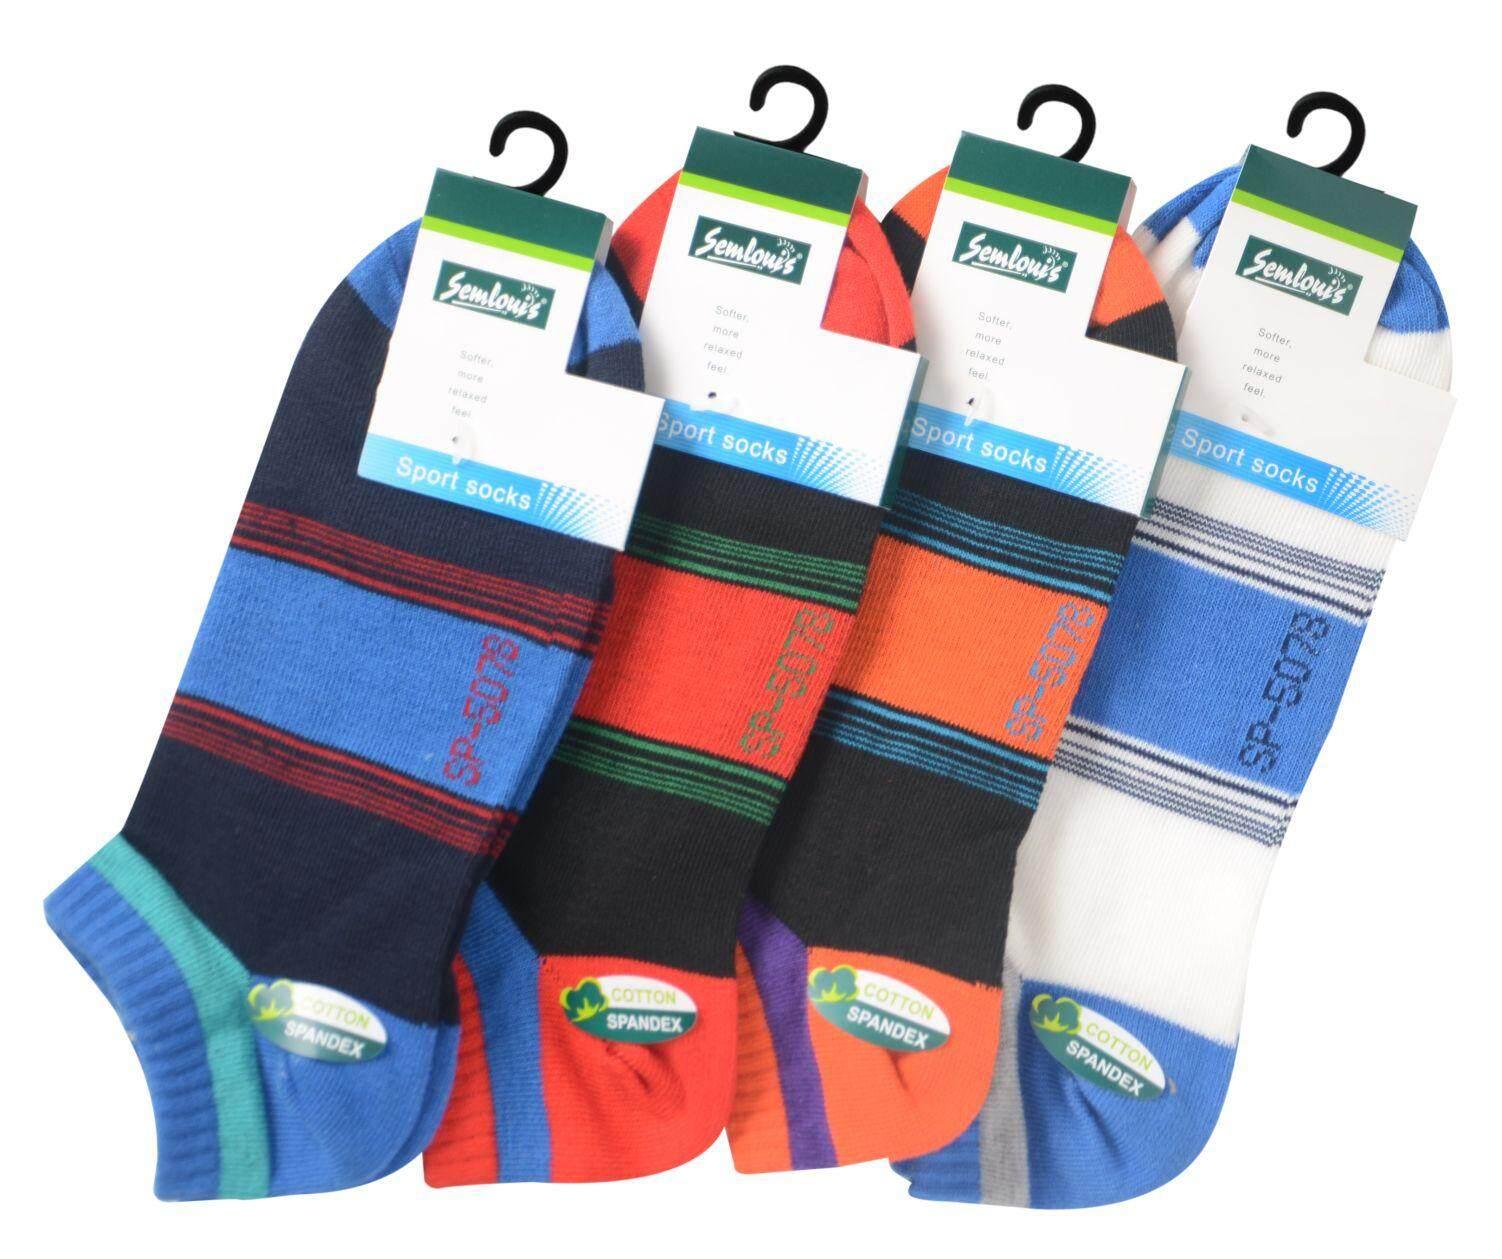 Semlouis Sport Ankle High Socks - Broad Stripes Mix Colour / PAIR